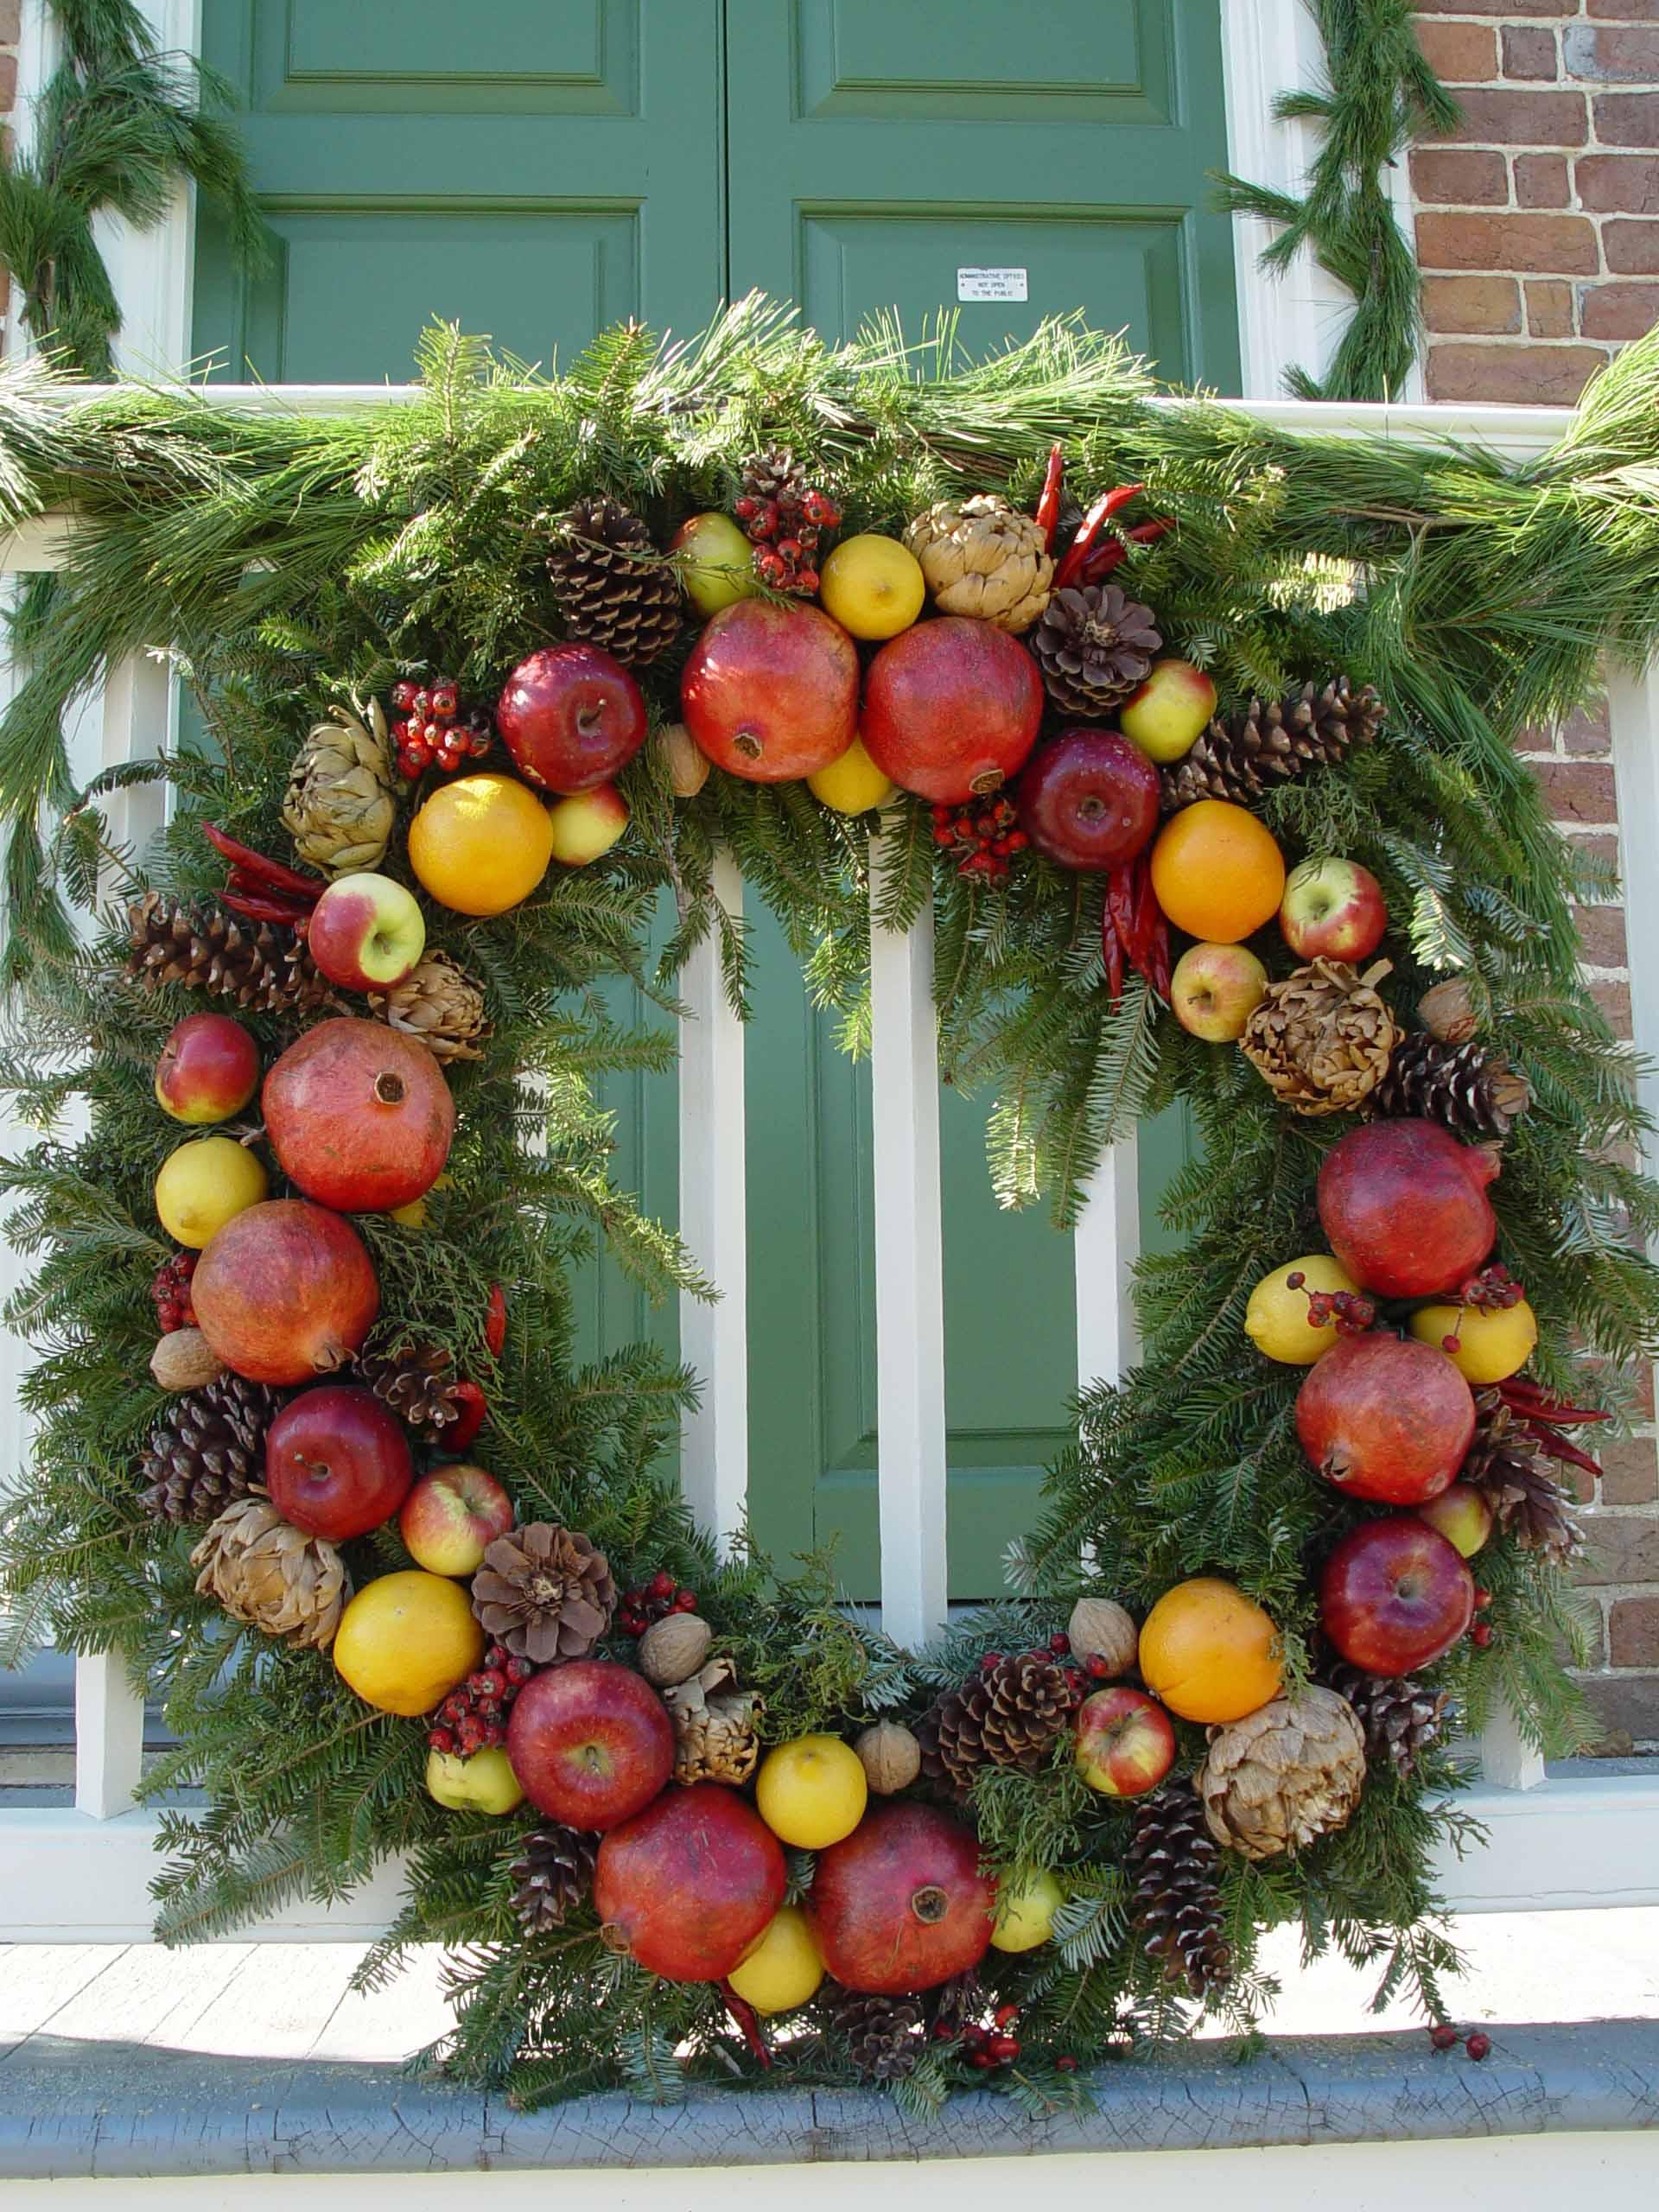 Fall Decor Wallpaper Top 8 Williamsburg Christmas Wreaths Garden Housecalls